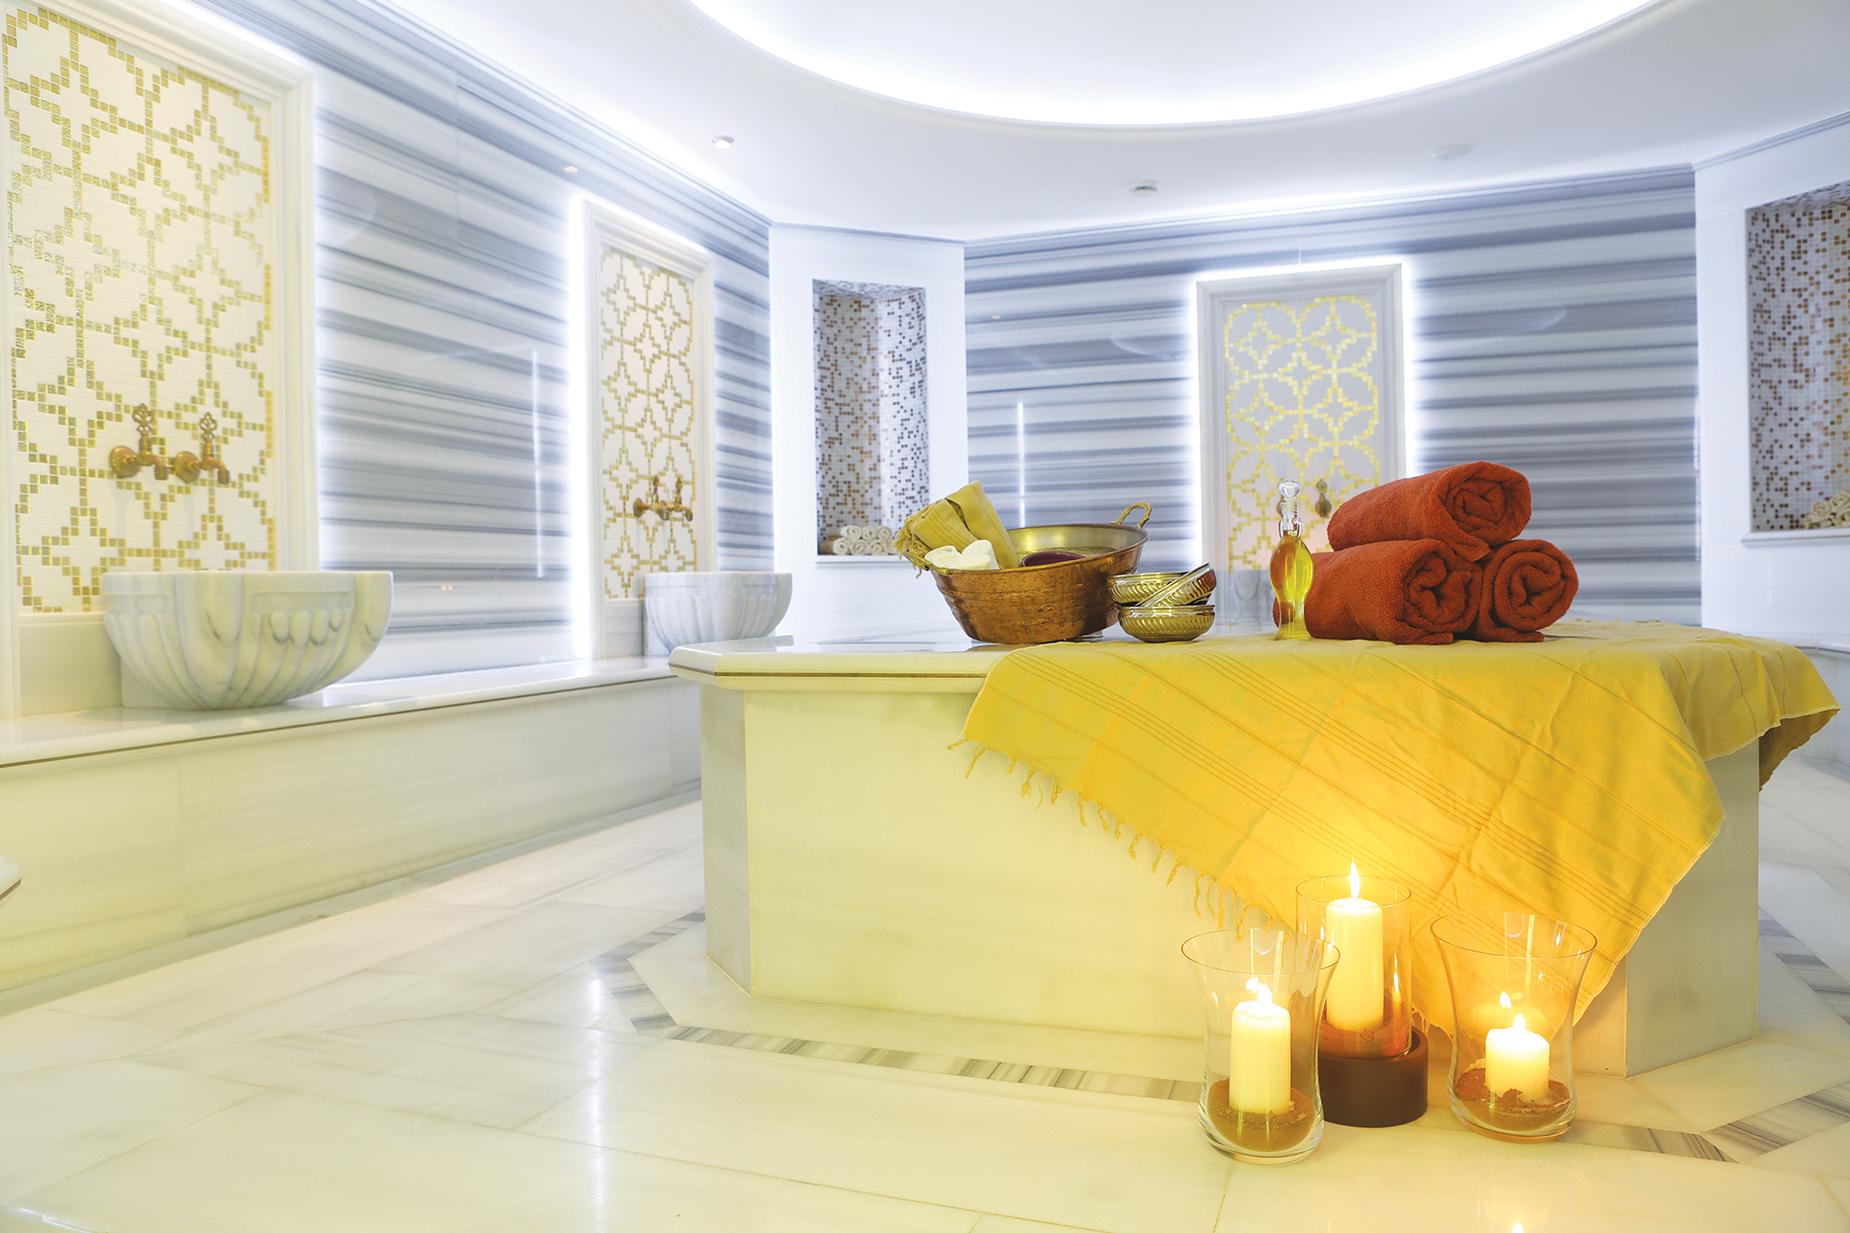 2 bed Apartment For Sale in San Lawrenz, Gozo, San Lawrenz - thumb 3